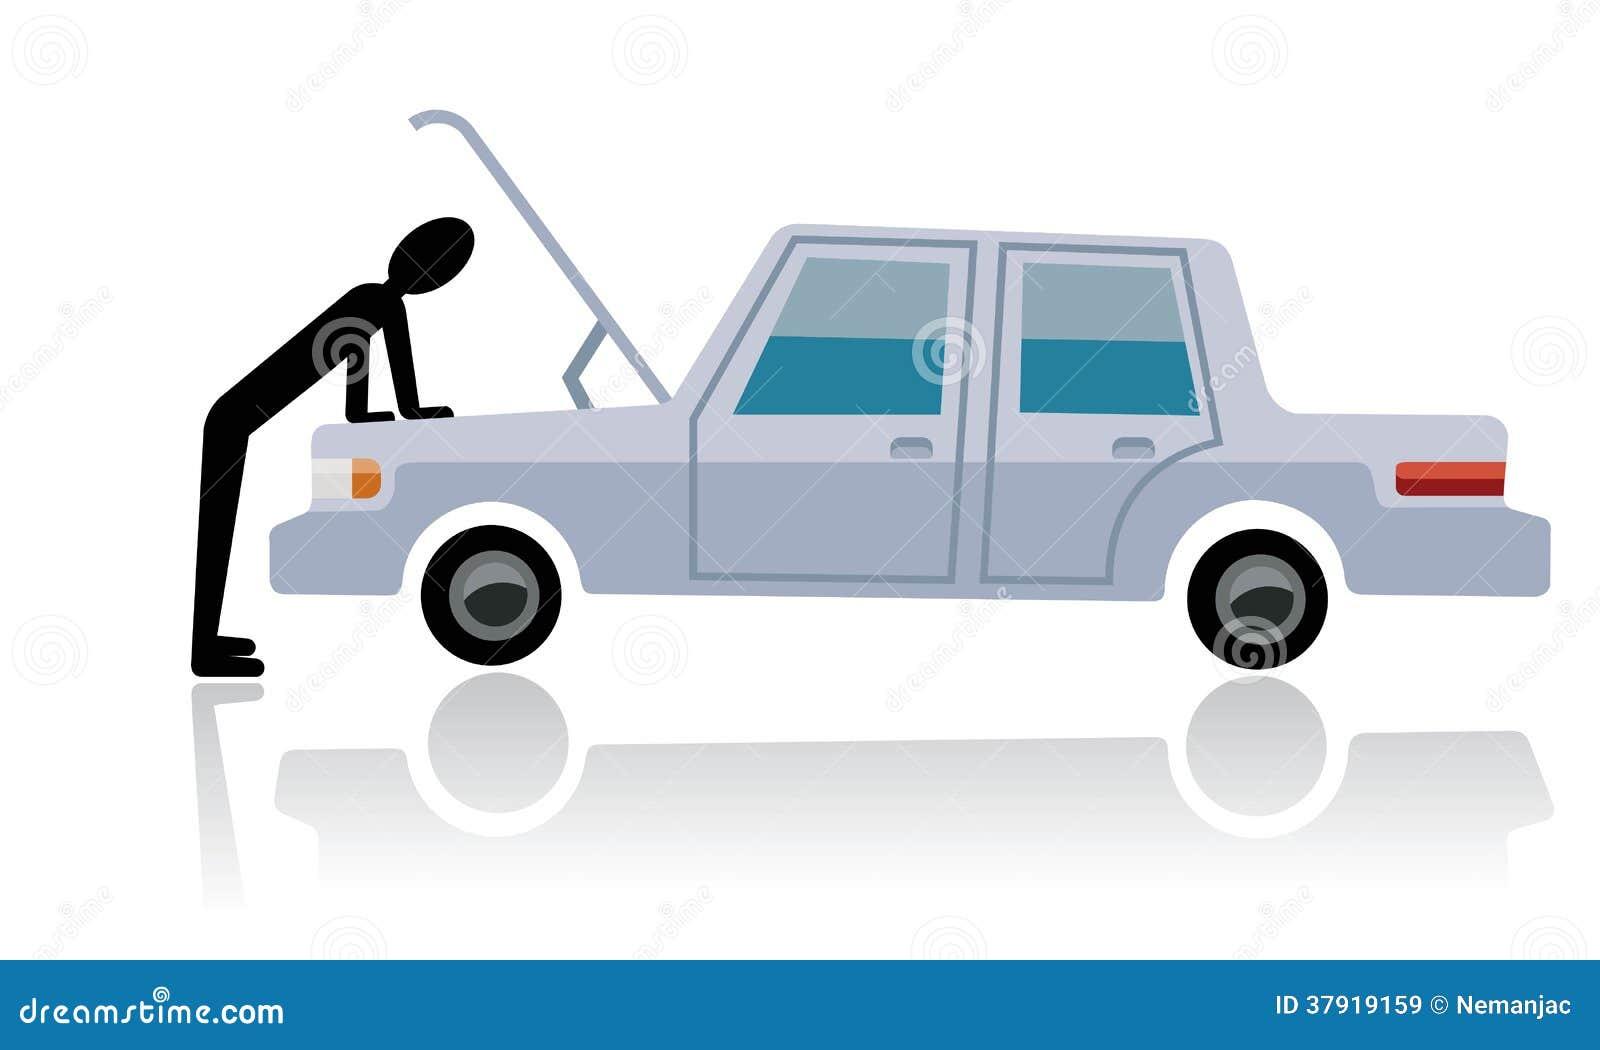 car breakdown man looking at broken car royalty free stock images image 37919159. Black Bedroom Furniture Sets. Home Design Ideas